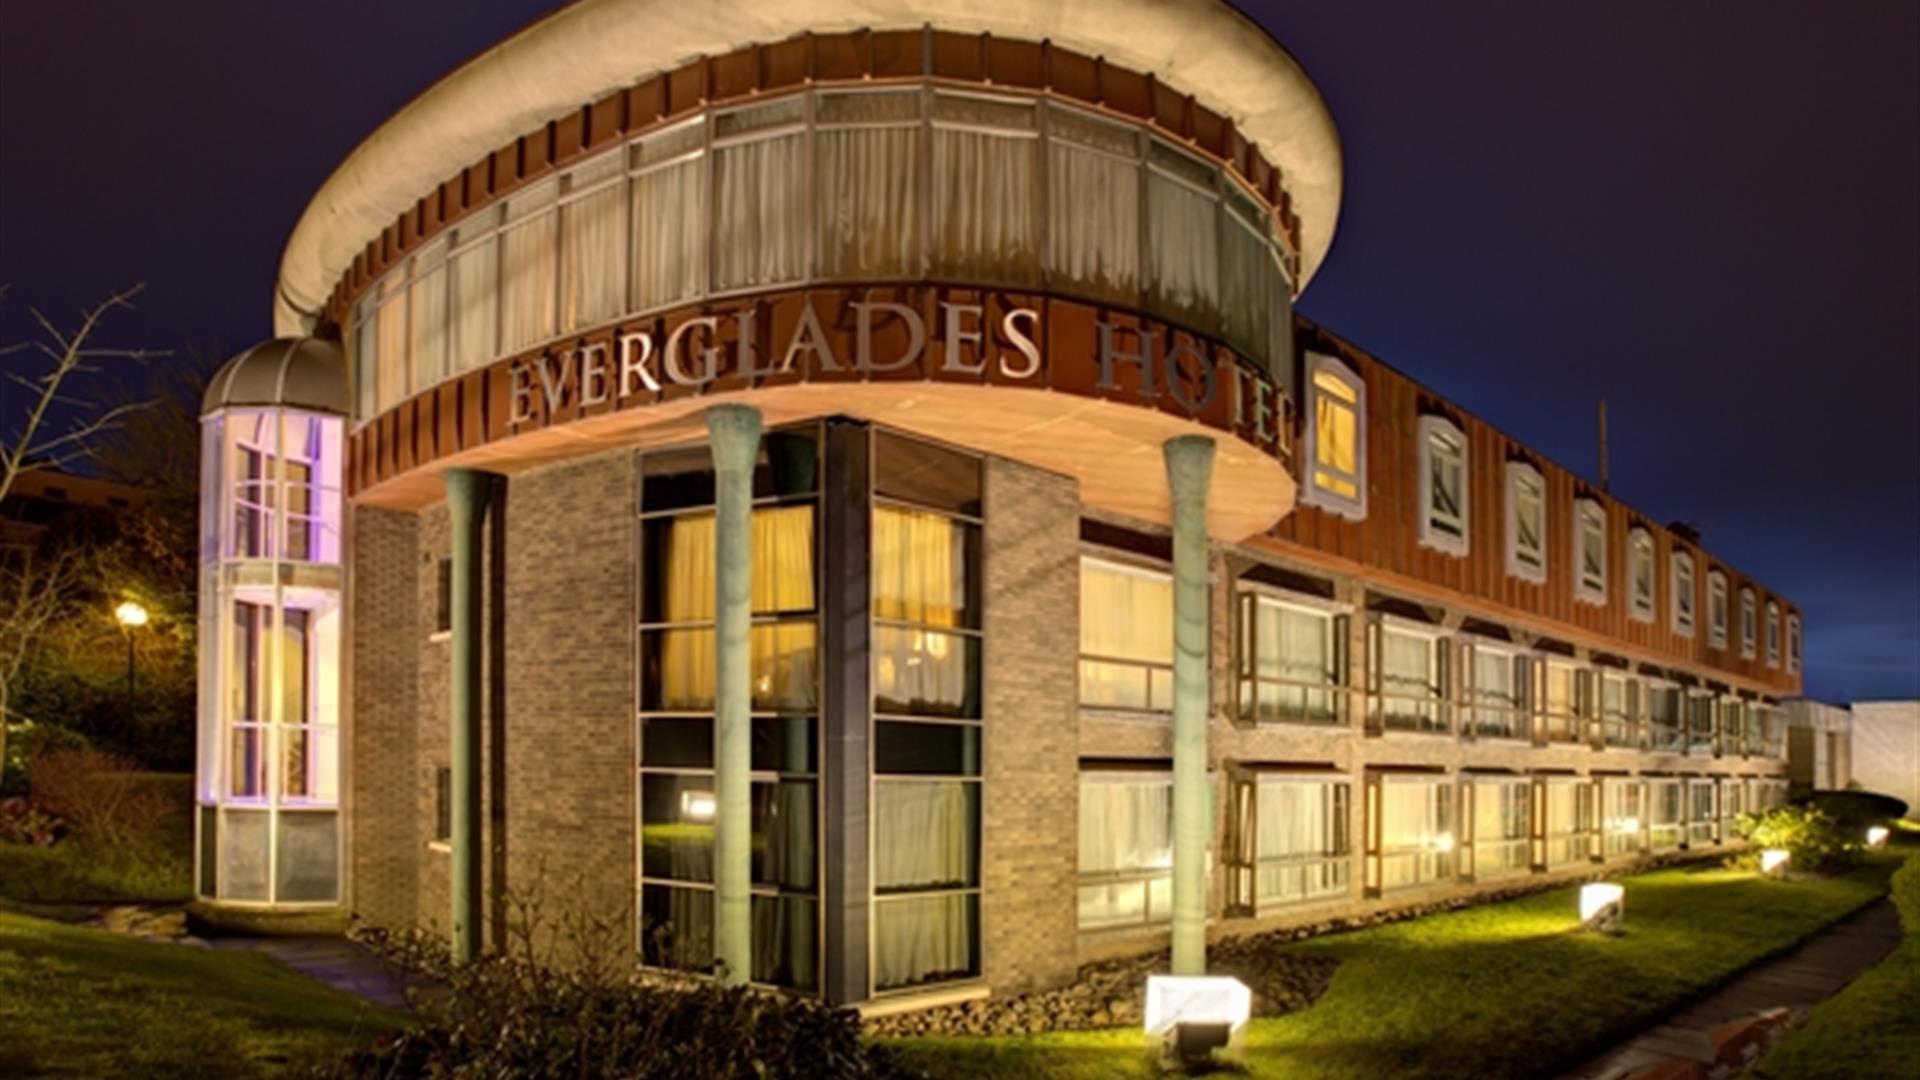 Exterior image of the Everglades Hotel